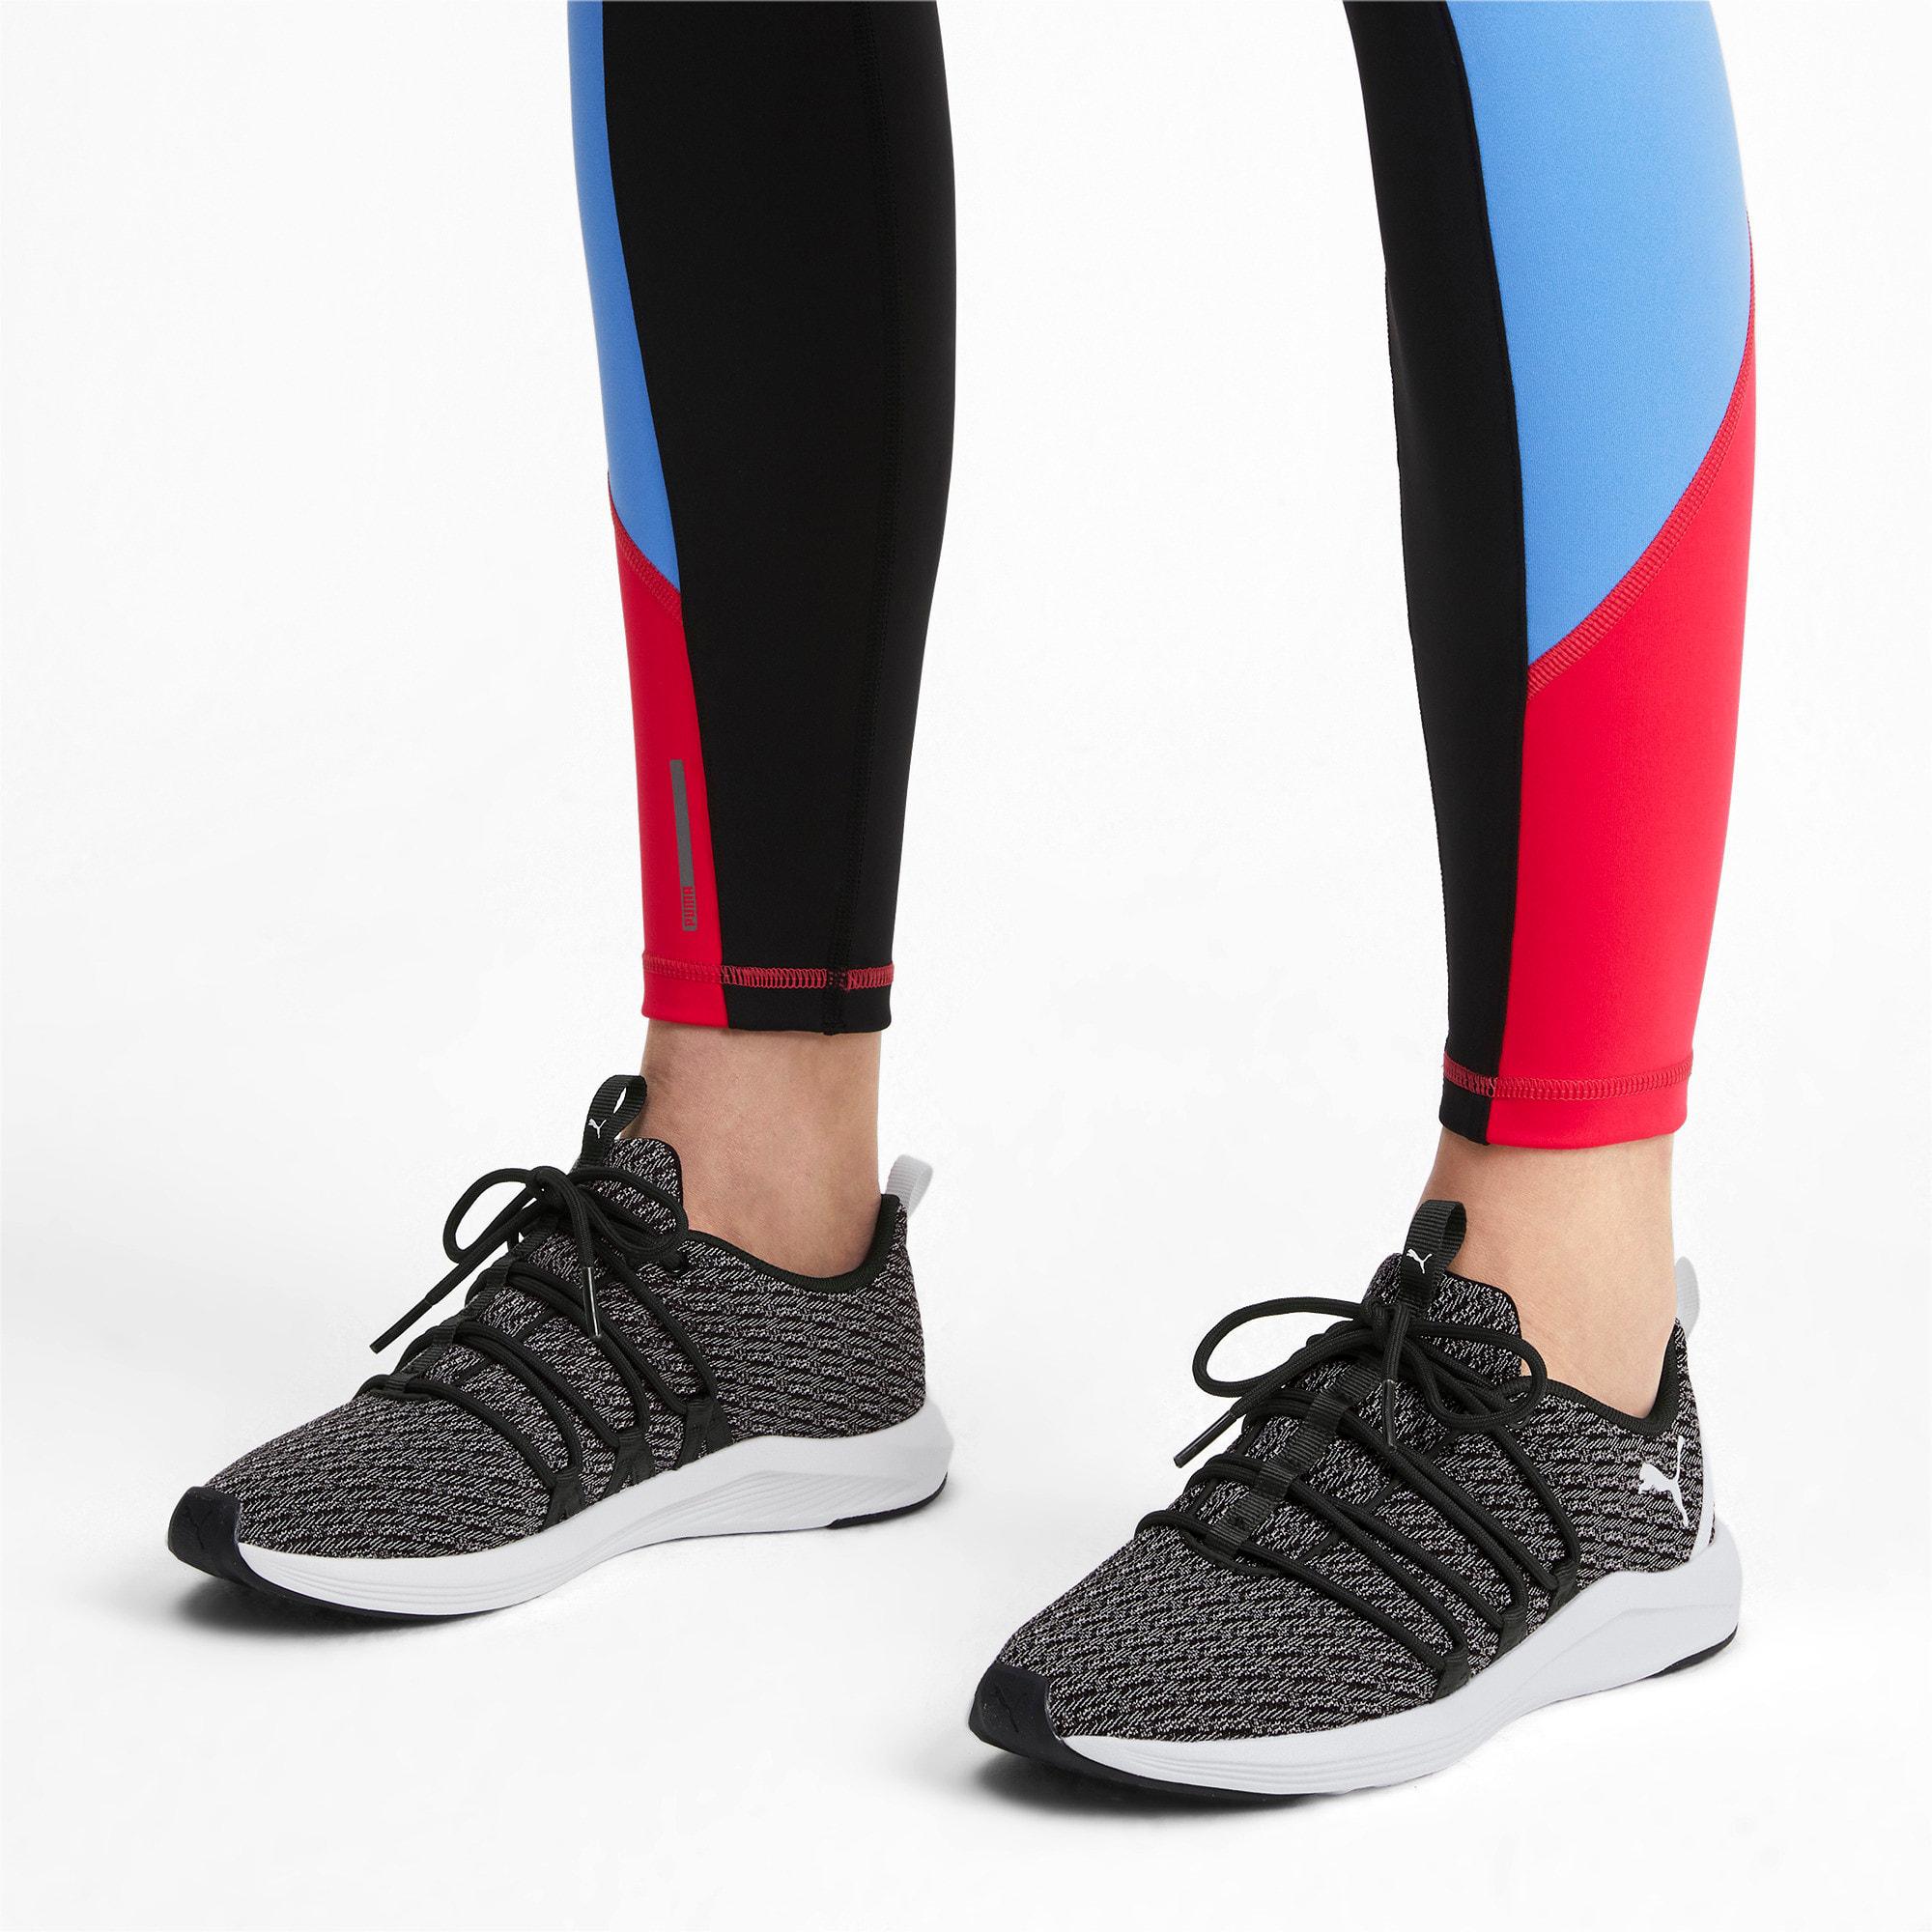 Thumbnail 2 of Prowl Alt Neon Women's Training Shoes, Puma Black-Puma White, medium